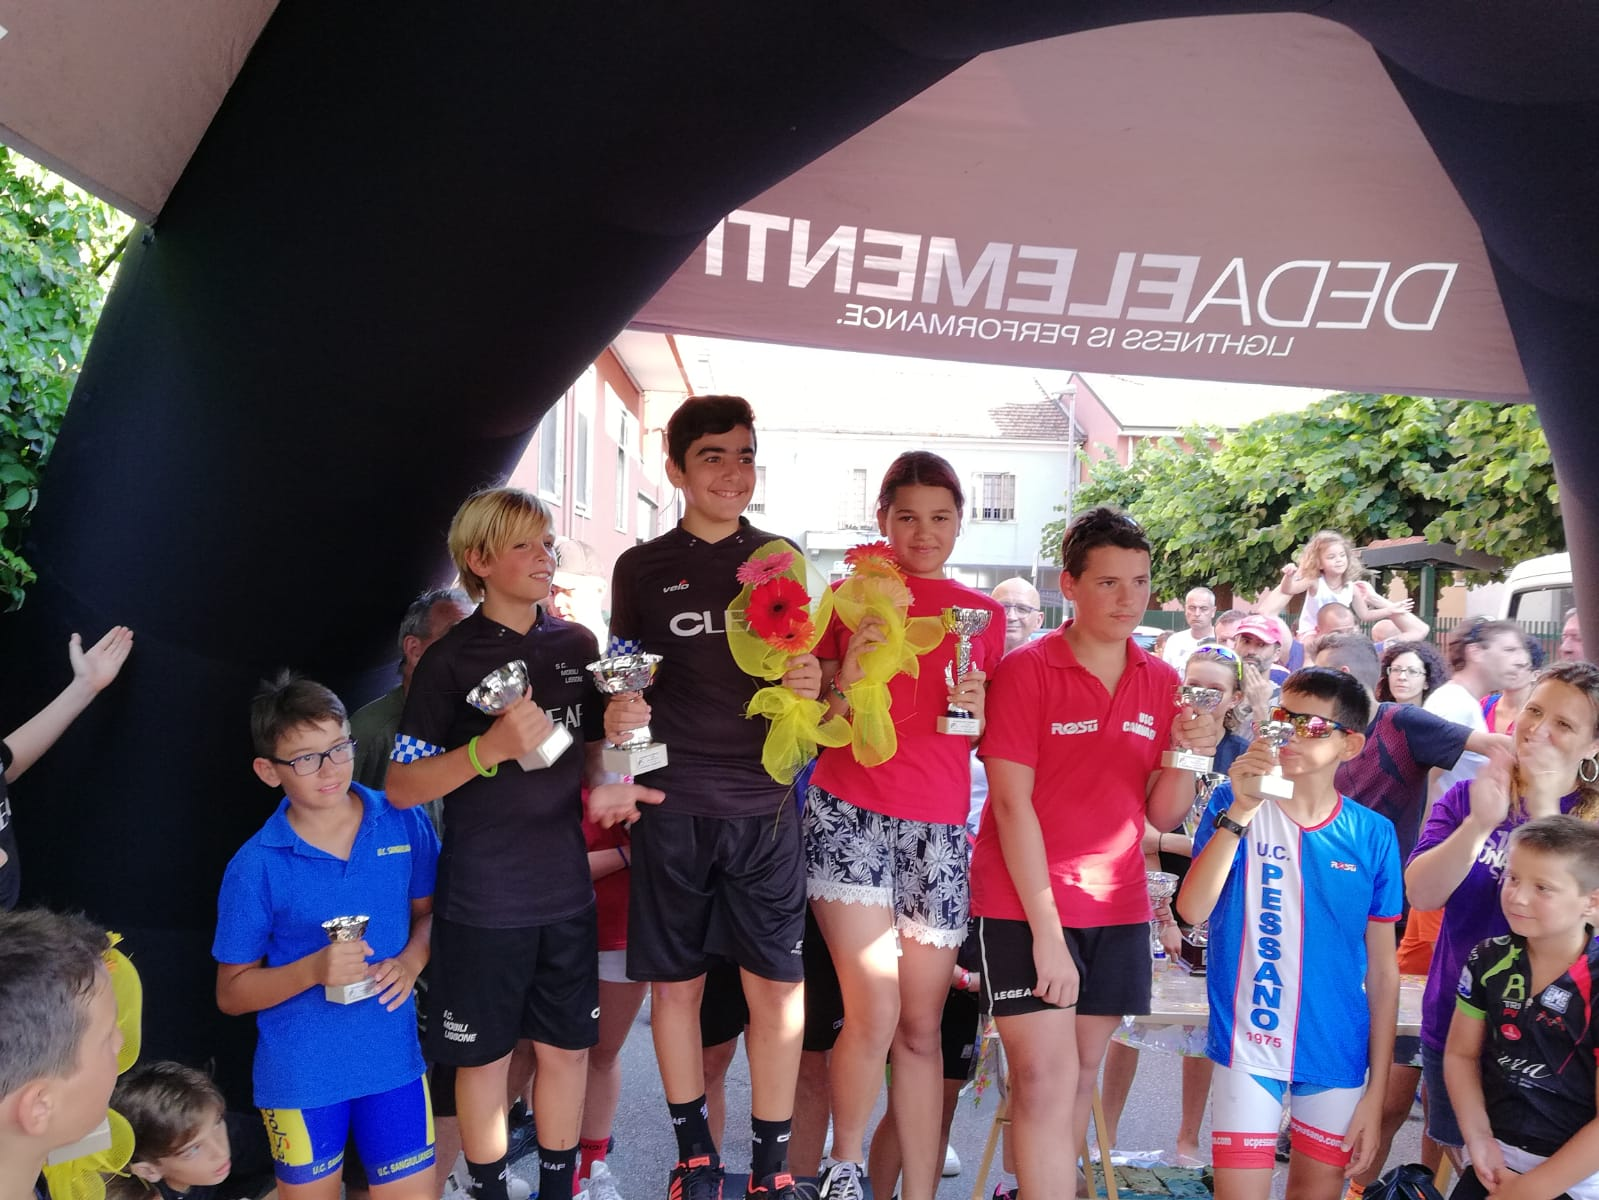 Sc Cesano Maderno ciclismo